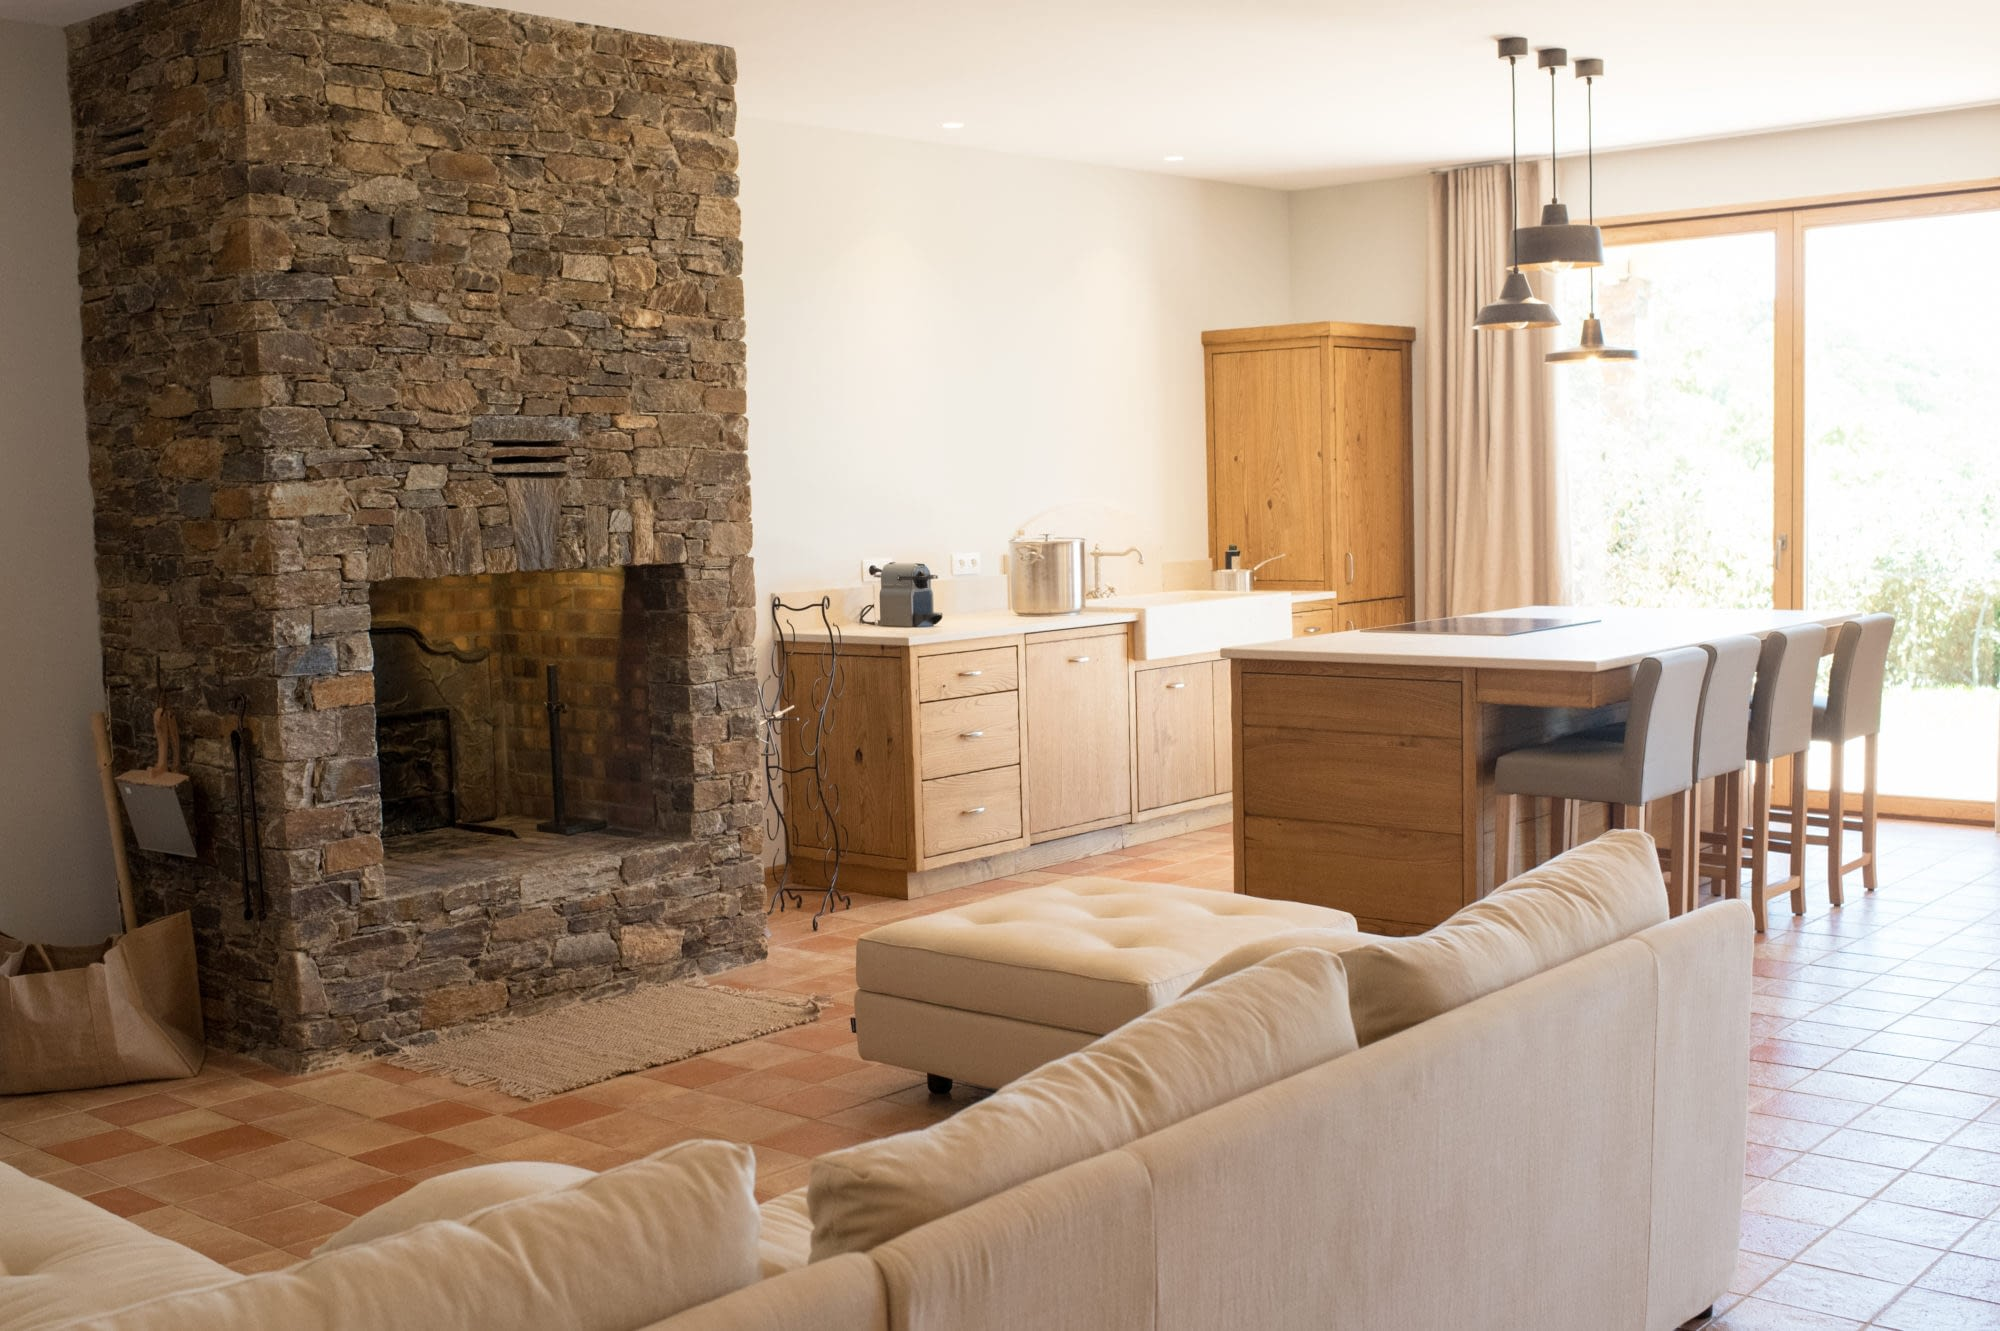 Cuisine et sallon avec cheminée dans Le grand chêne / Kitchen and living room with chimney in the house Le grand chêne